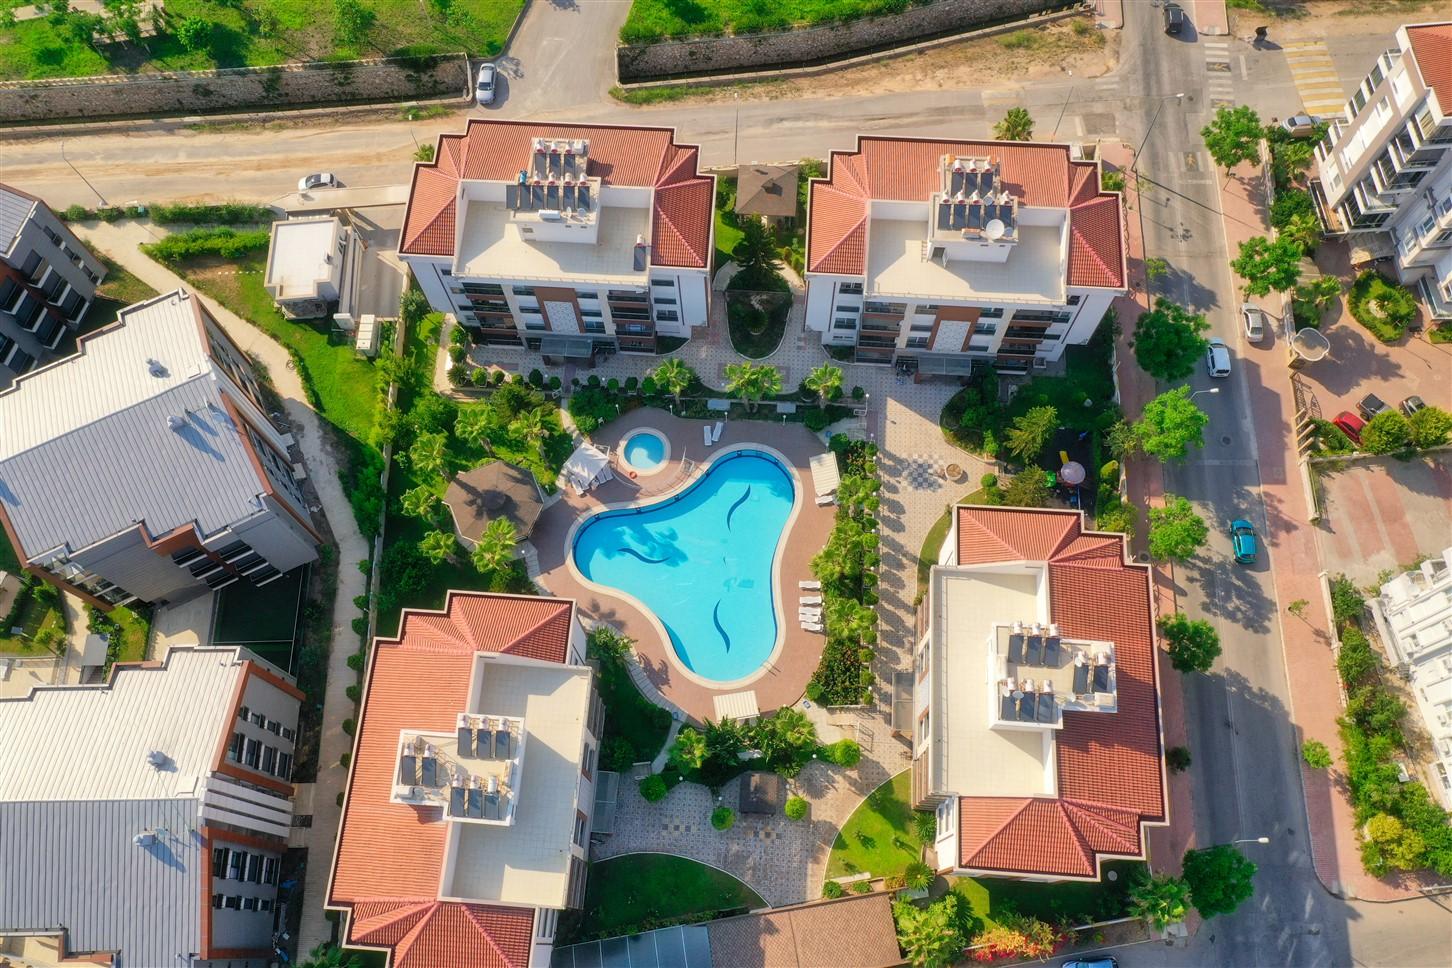 Четырёхкомнатная квартира в микрорайоне Унджалы - Фото 1